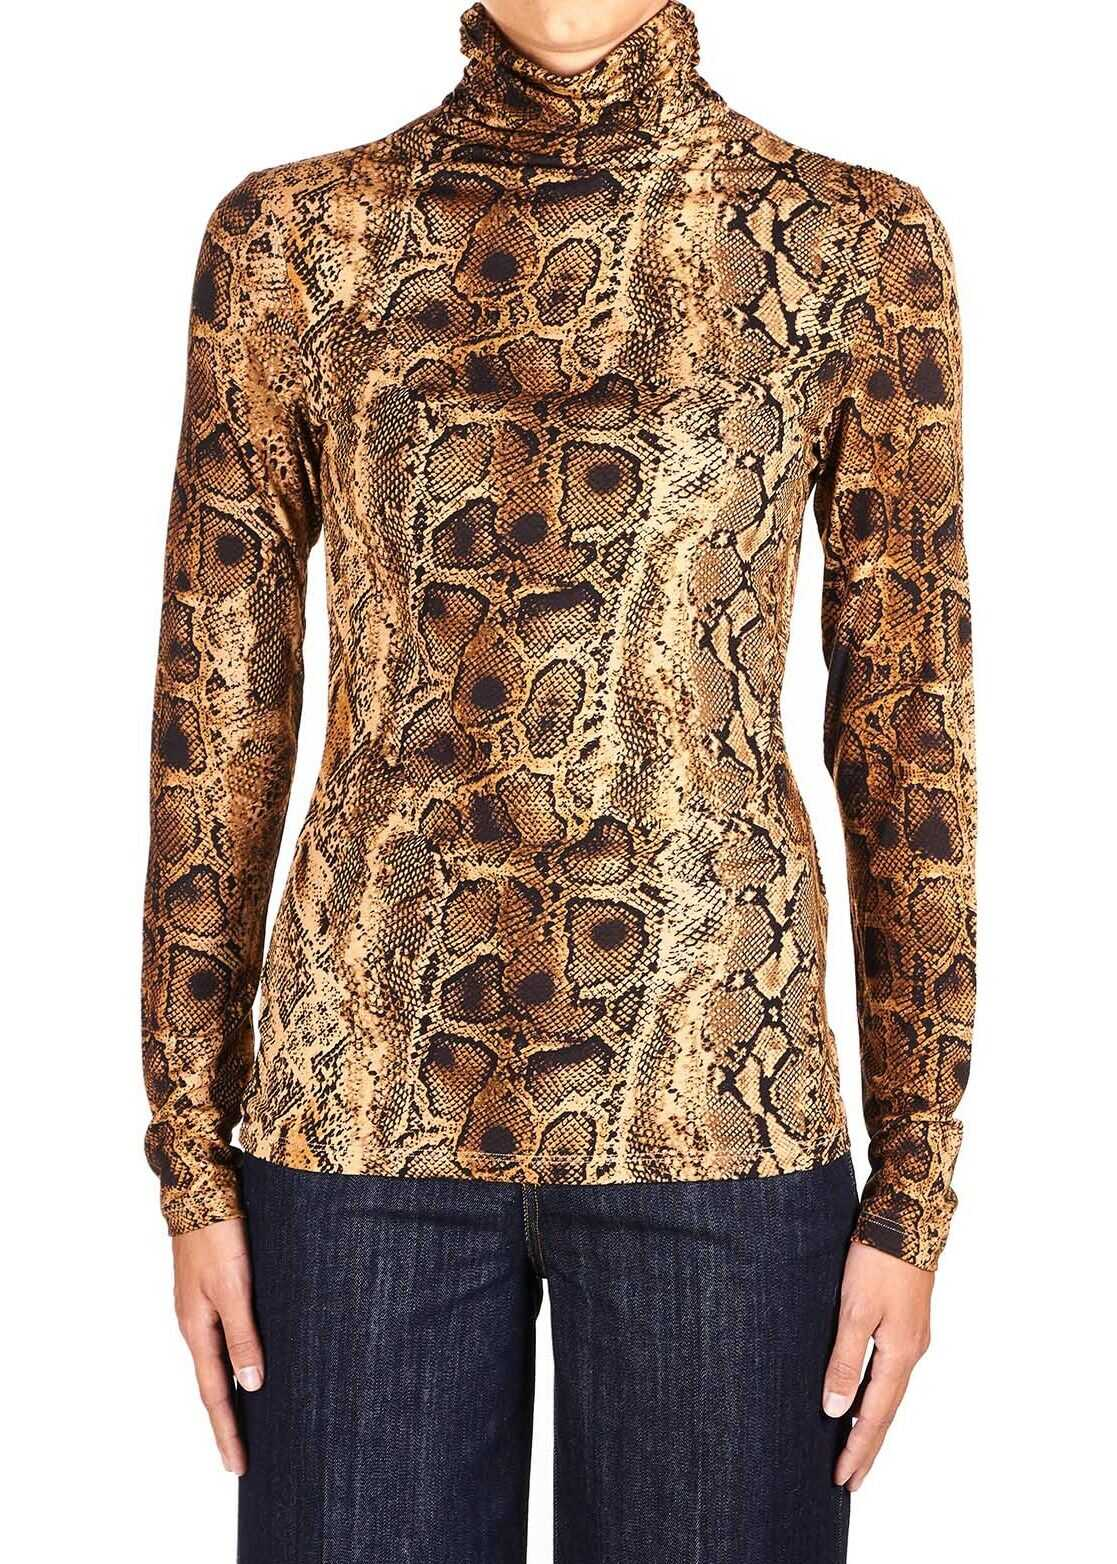 Liu Jo Printed turtleneck shirt Brown